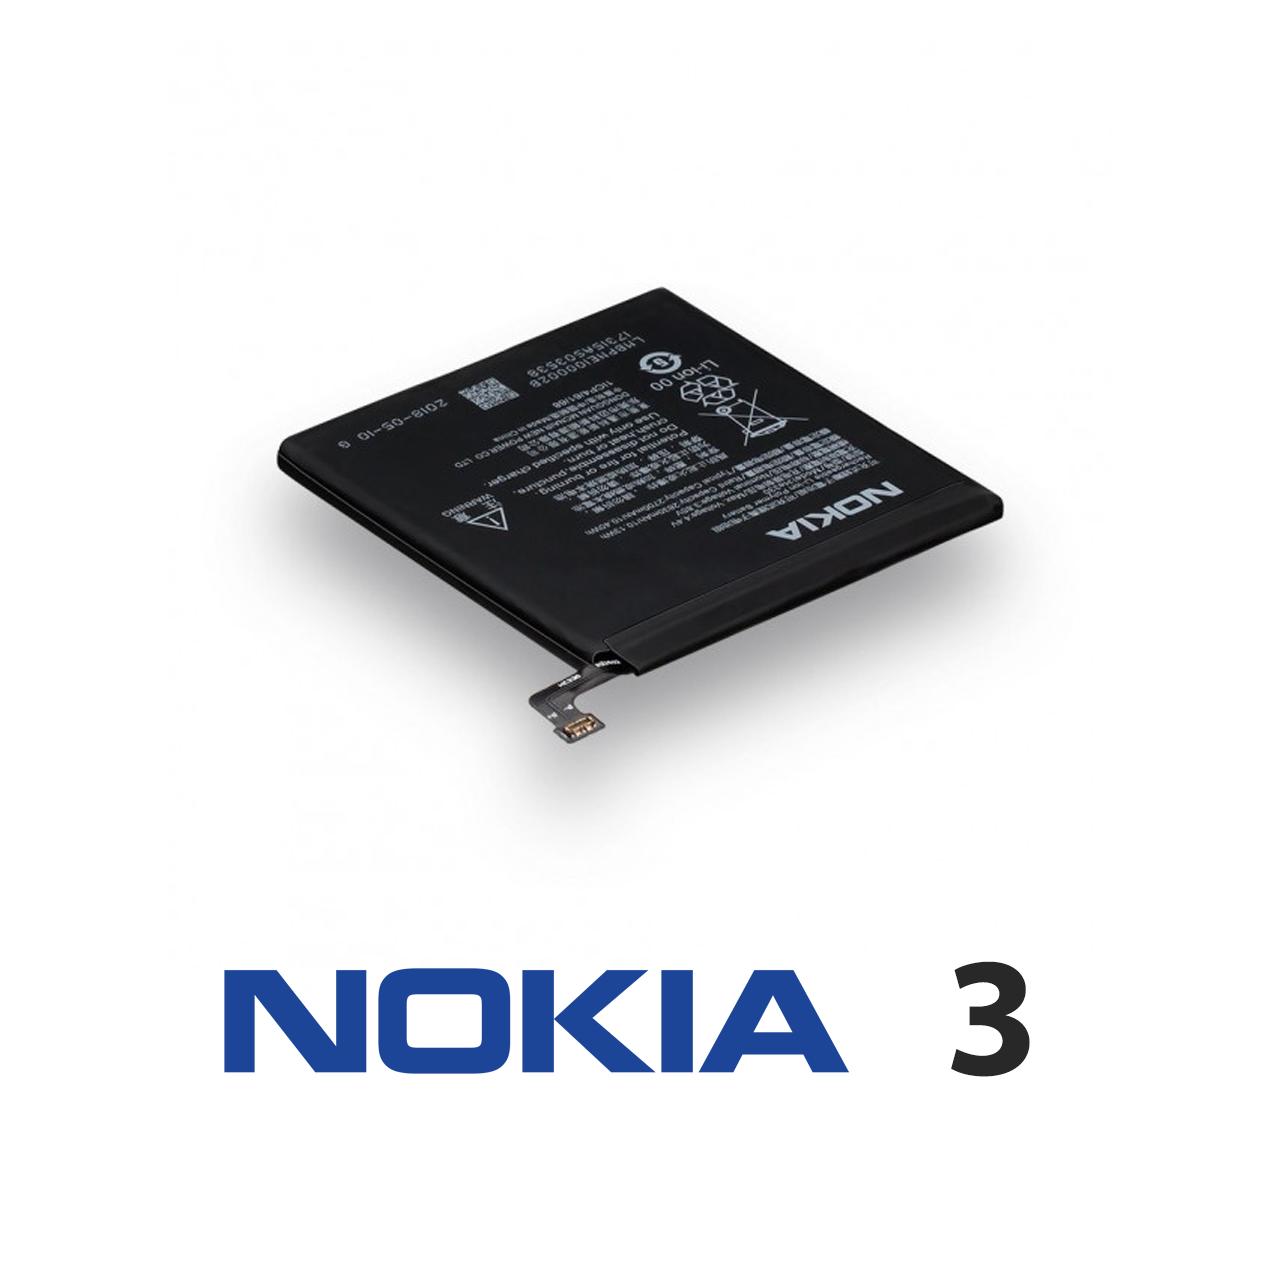 Аккумулятор Nokia 3 (HE330), батарея нокиа нокия не330